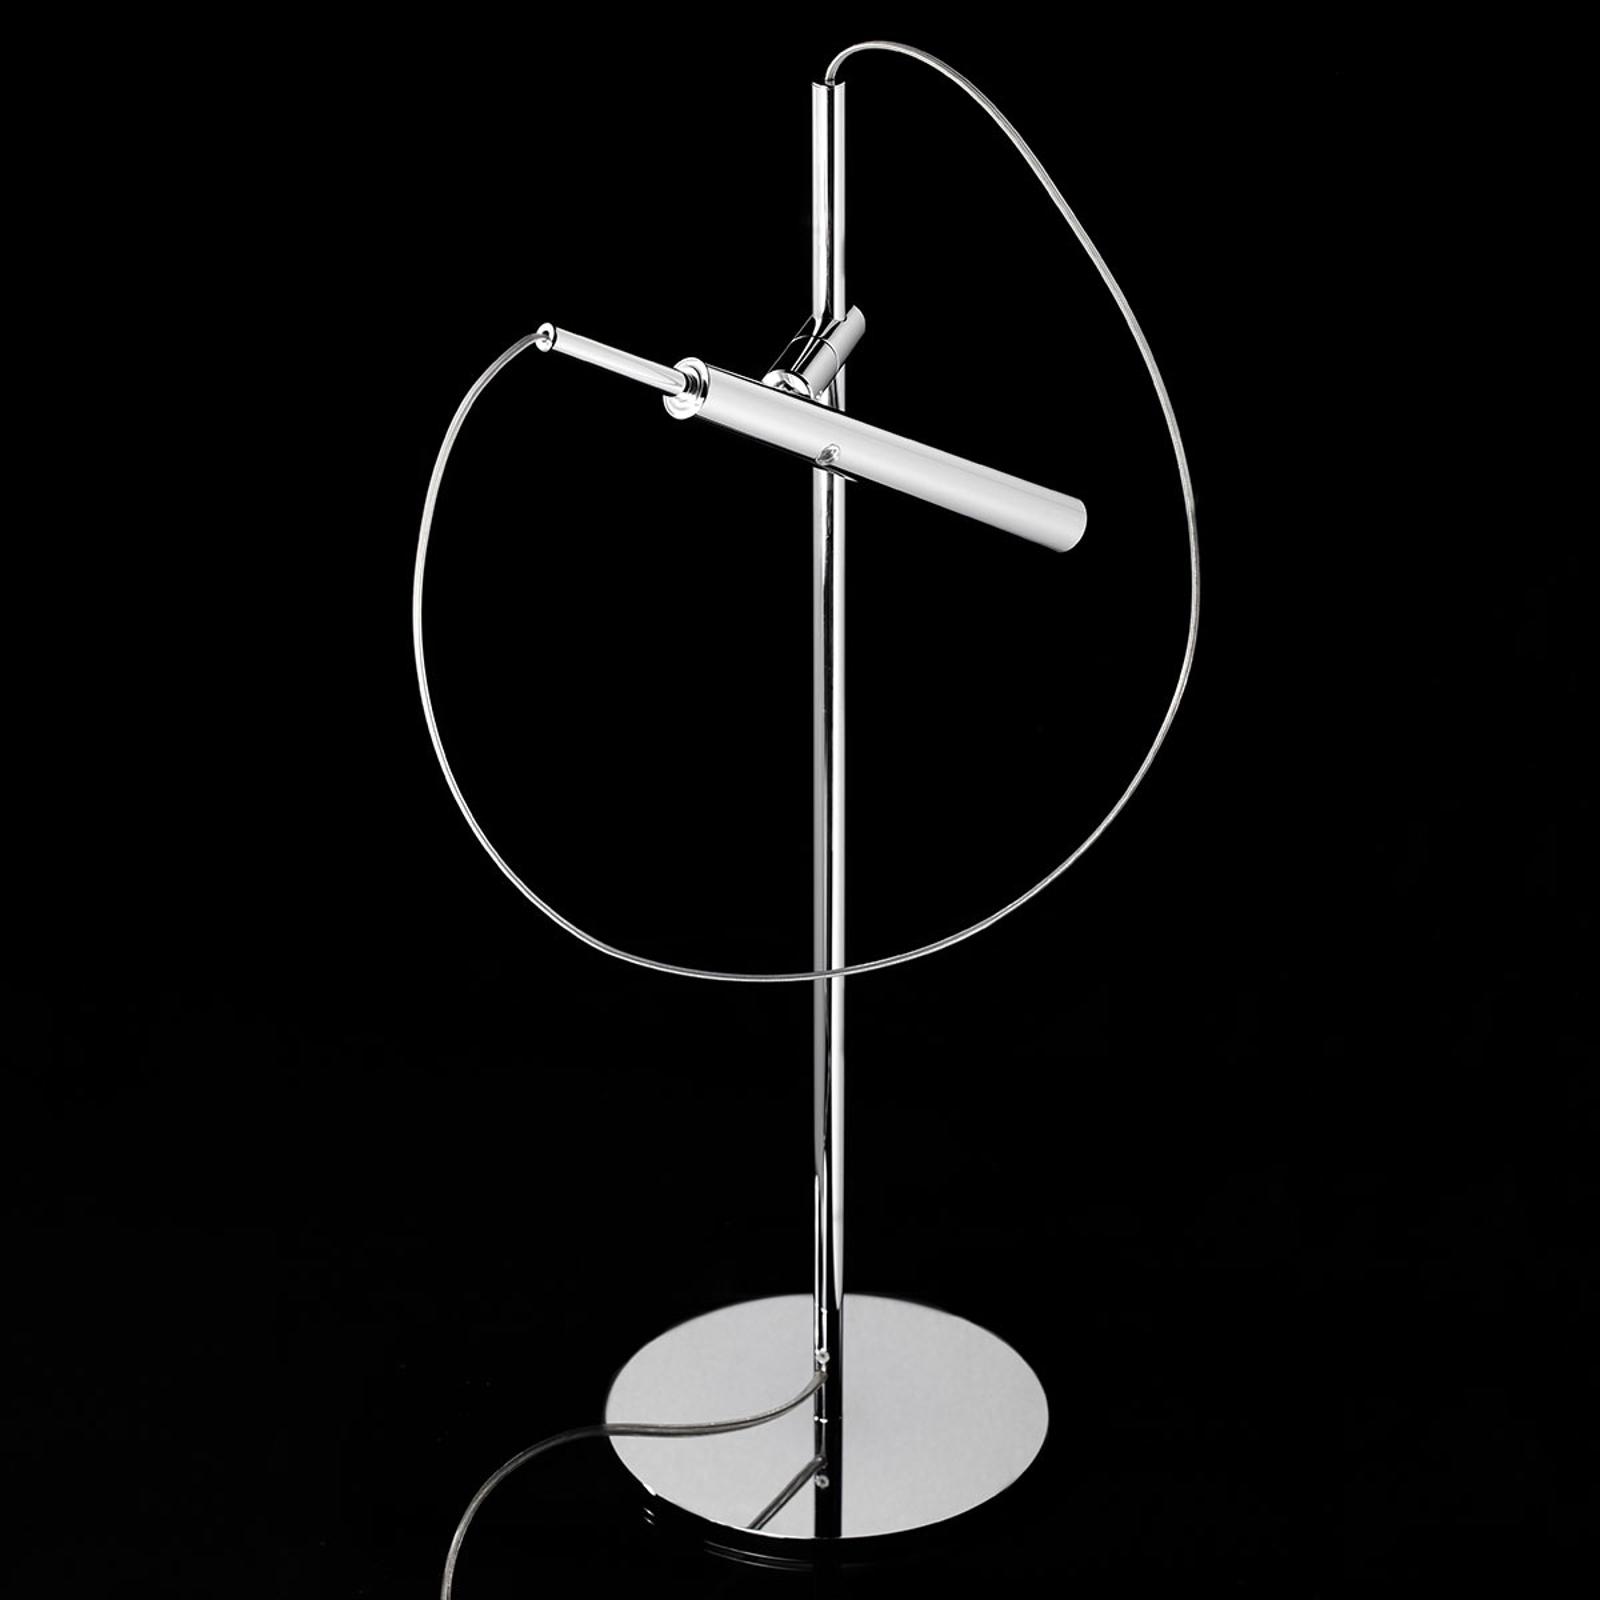 LDM Eccoled Flamingo Tablo LED-Tischleuchte, chrom